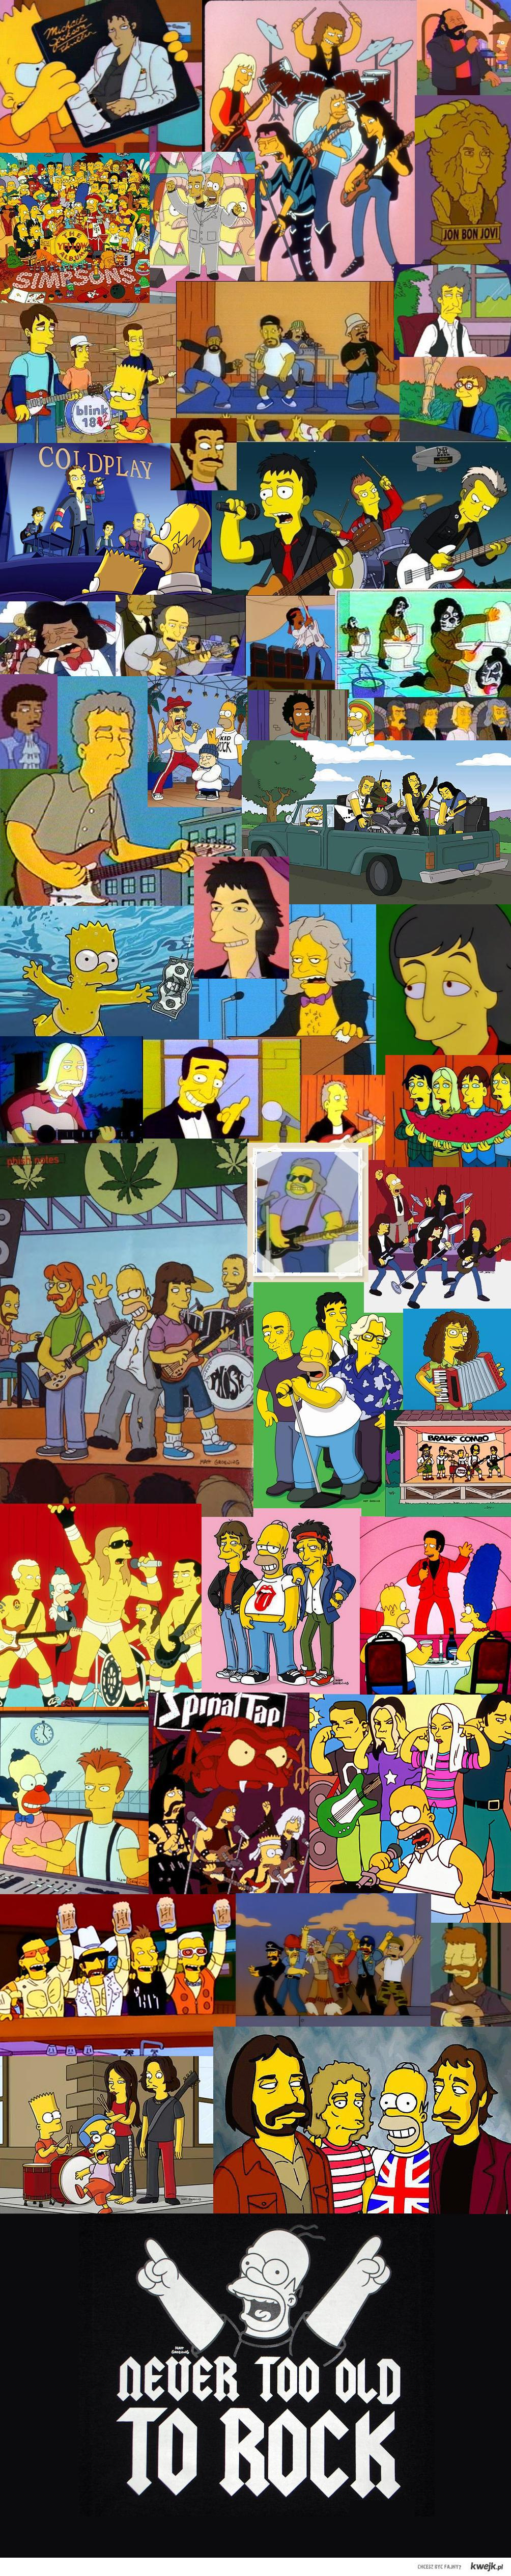 Simpsons rock